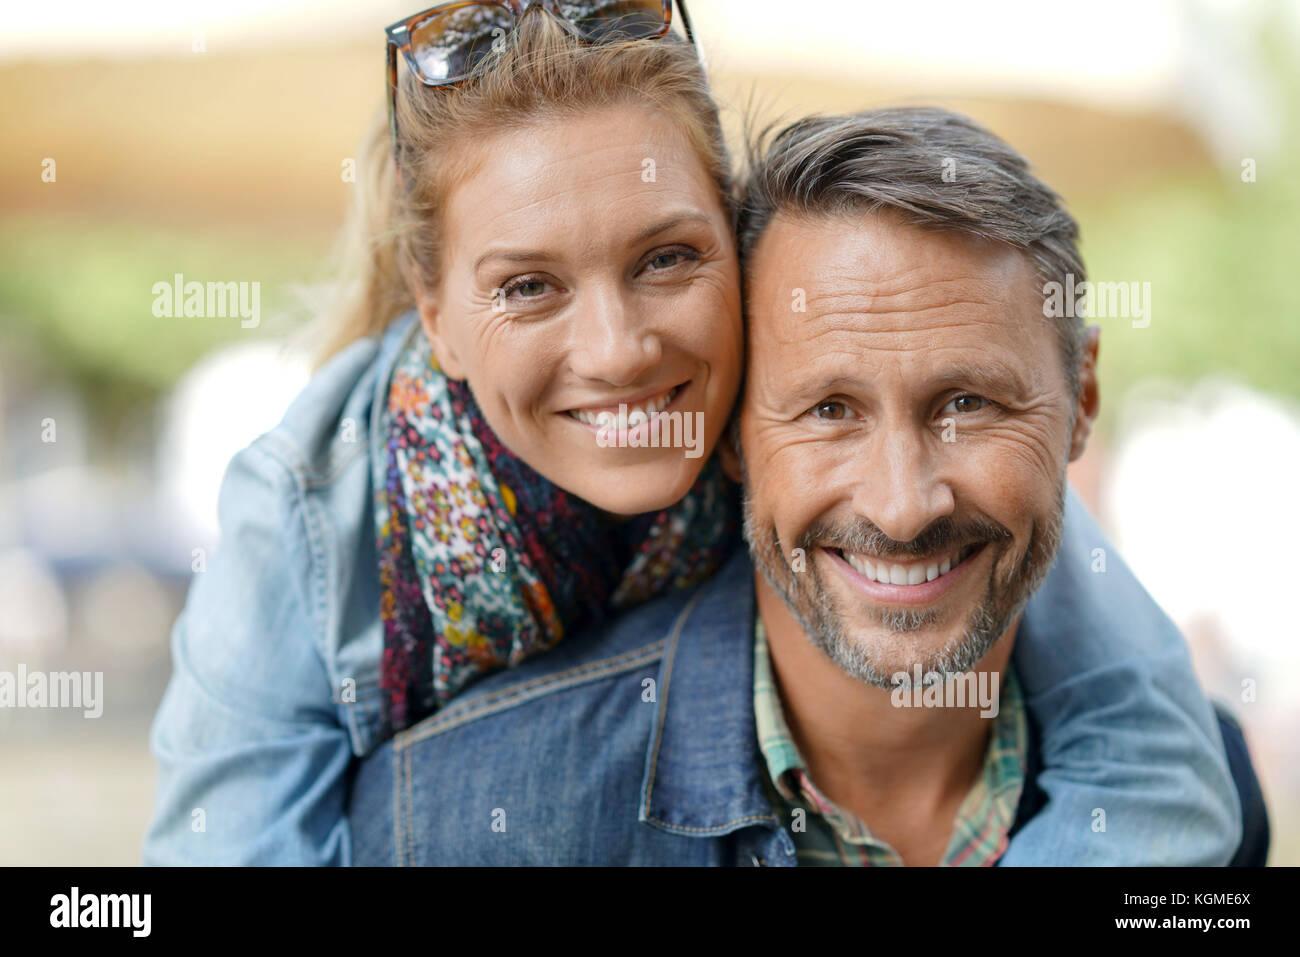 Man giving piggyback ride to woman Photo Stock